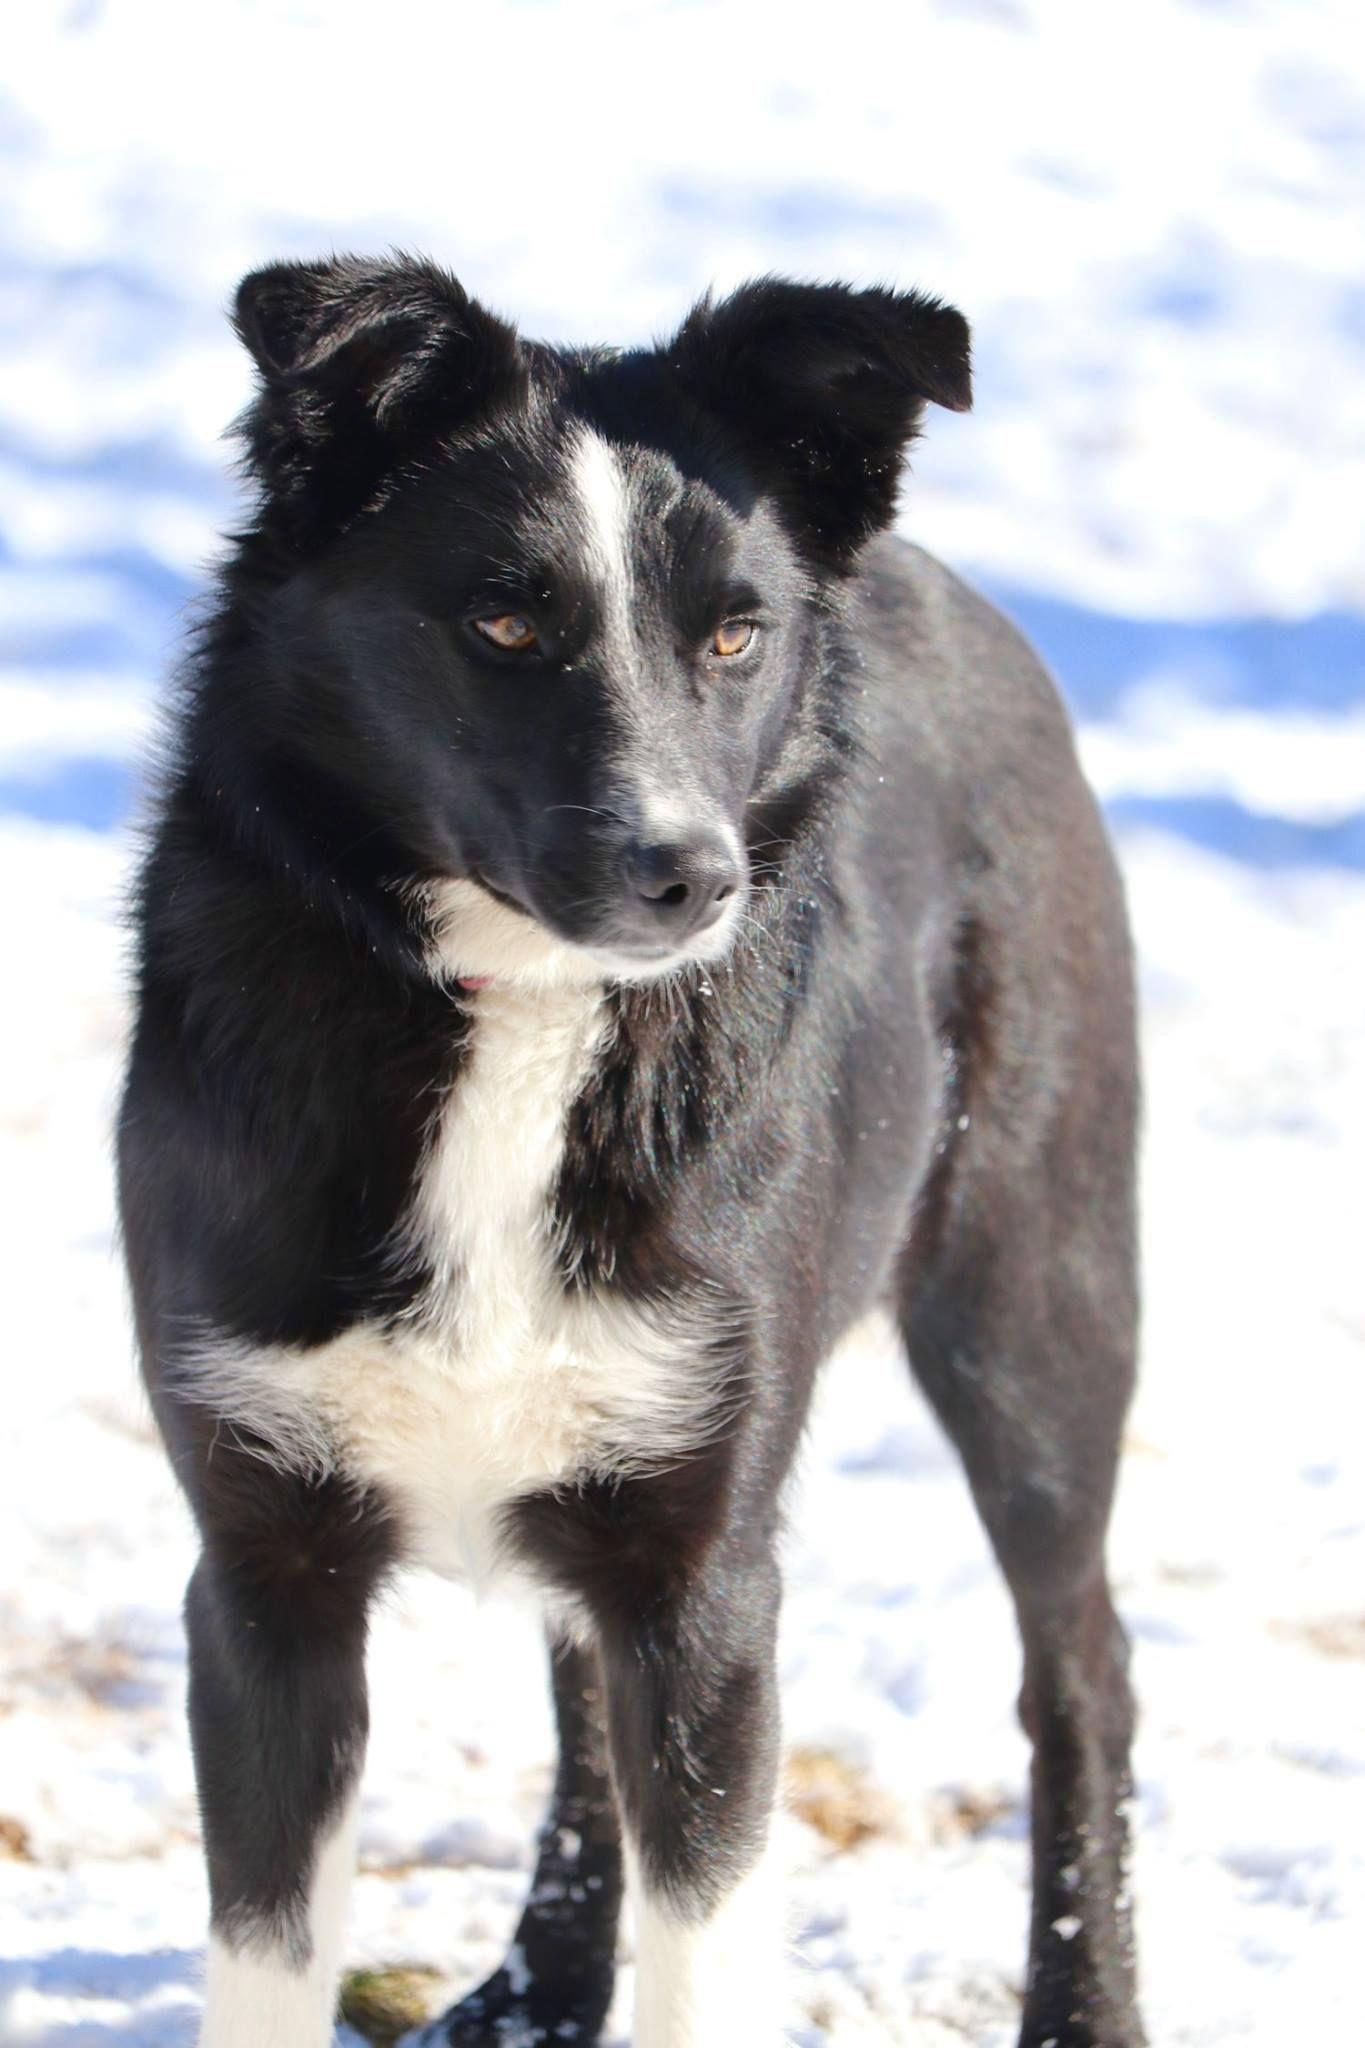 Border Collie Dog For Adoption In Paisley Or Adn 793417 On Puppyfinder Com Gender Female Age Young